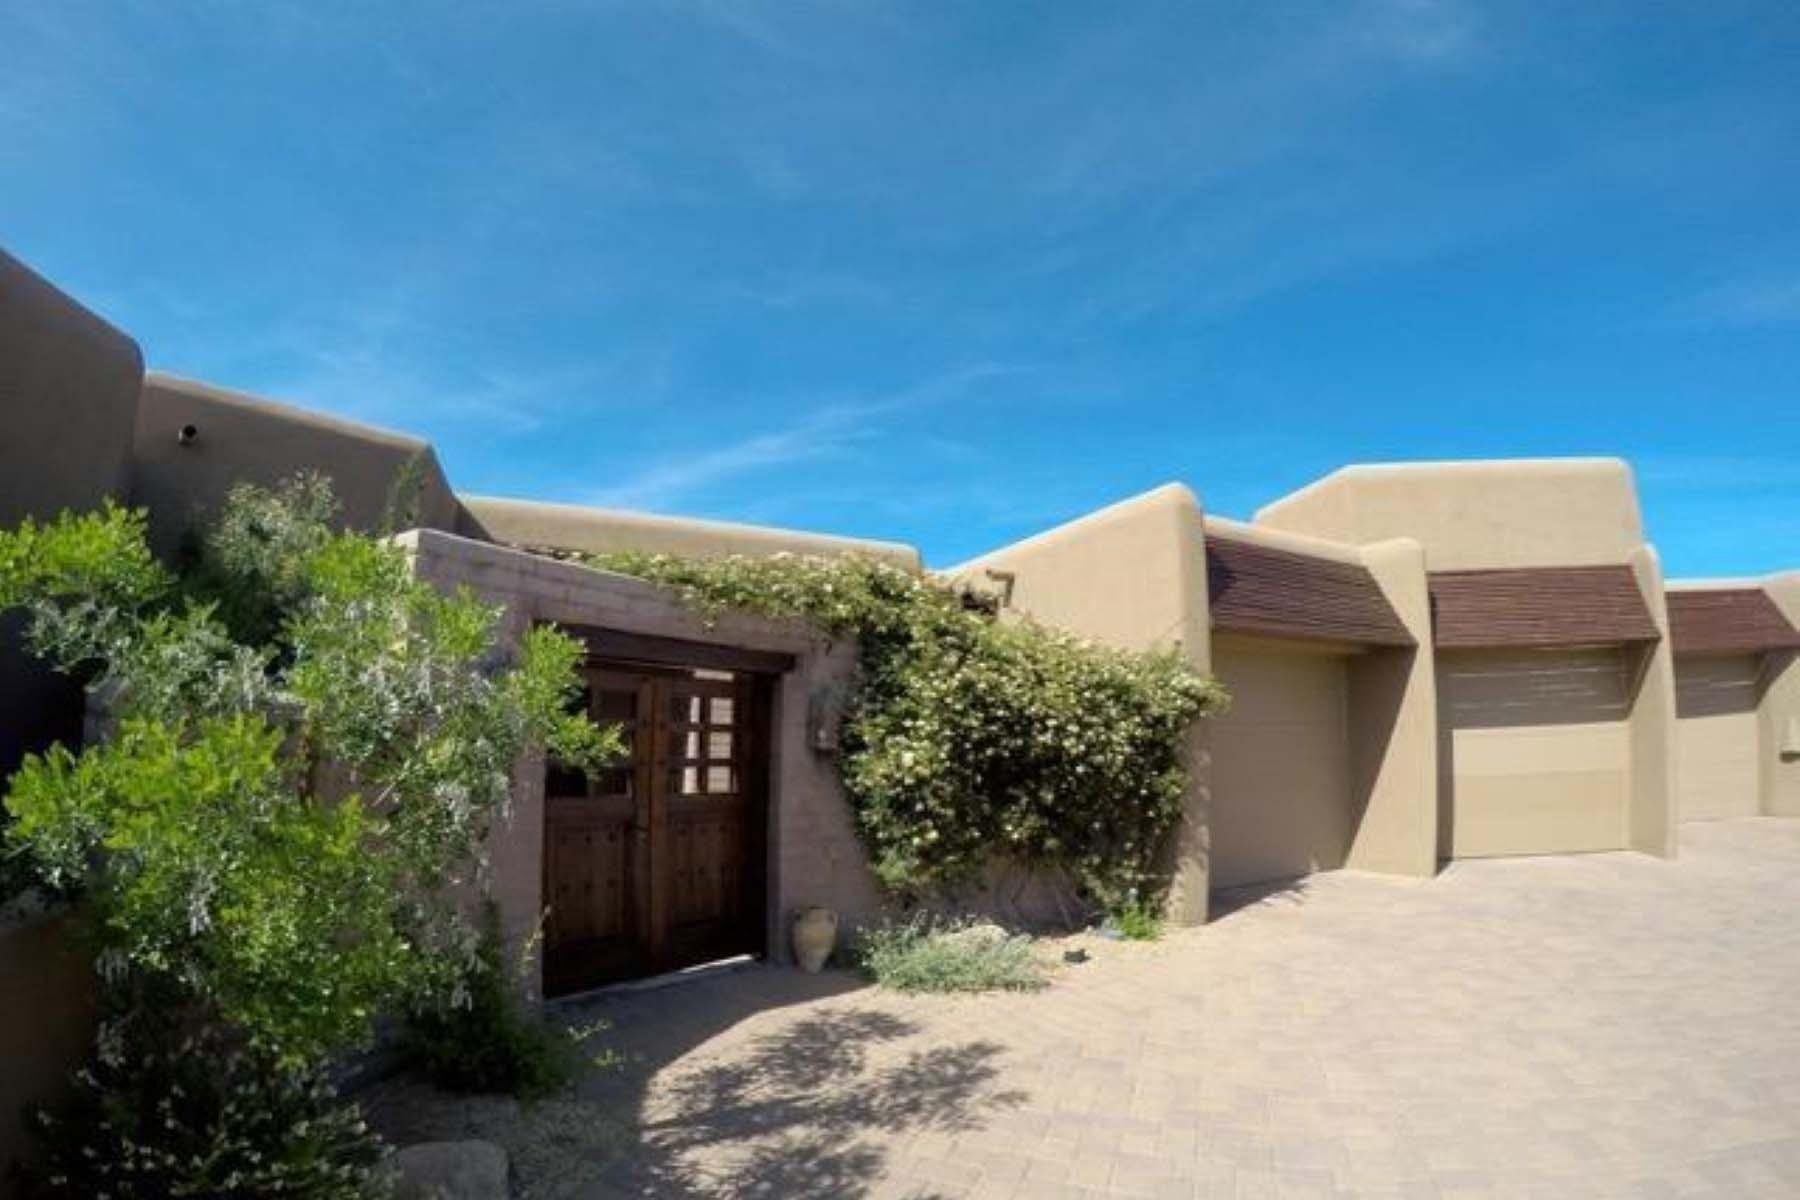 Casa para uma família para Venda às This beautiful home is a private sanctuary in the desert. 39727 N 106TH PL #111 Scottsdale, Arizona 85262 Estados Unidos